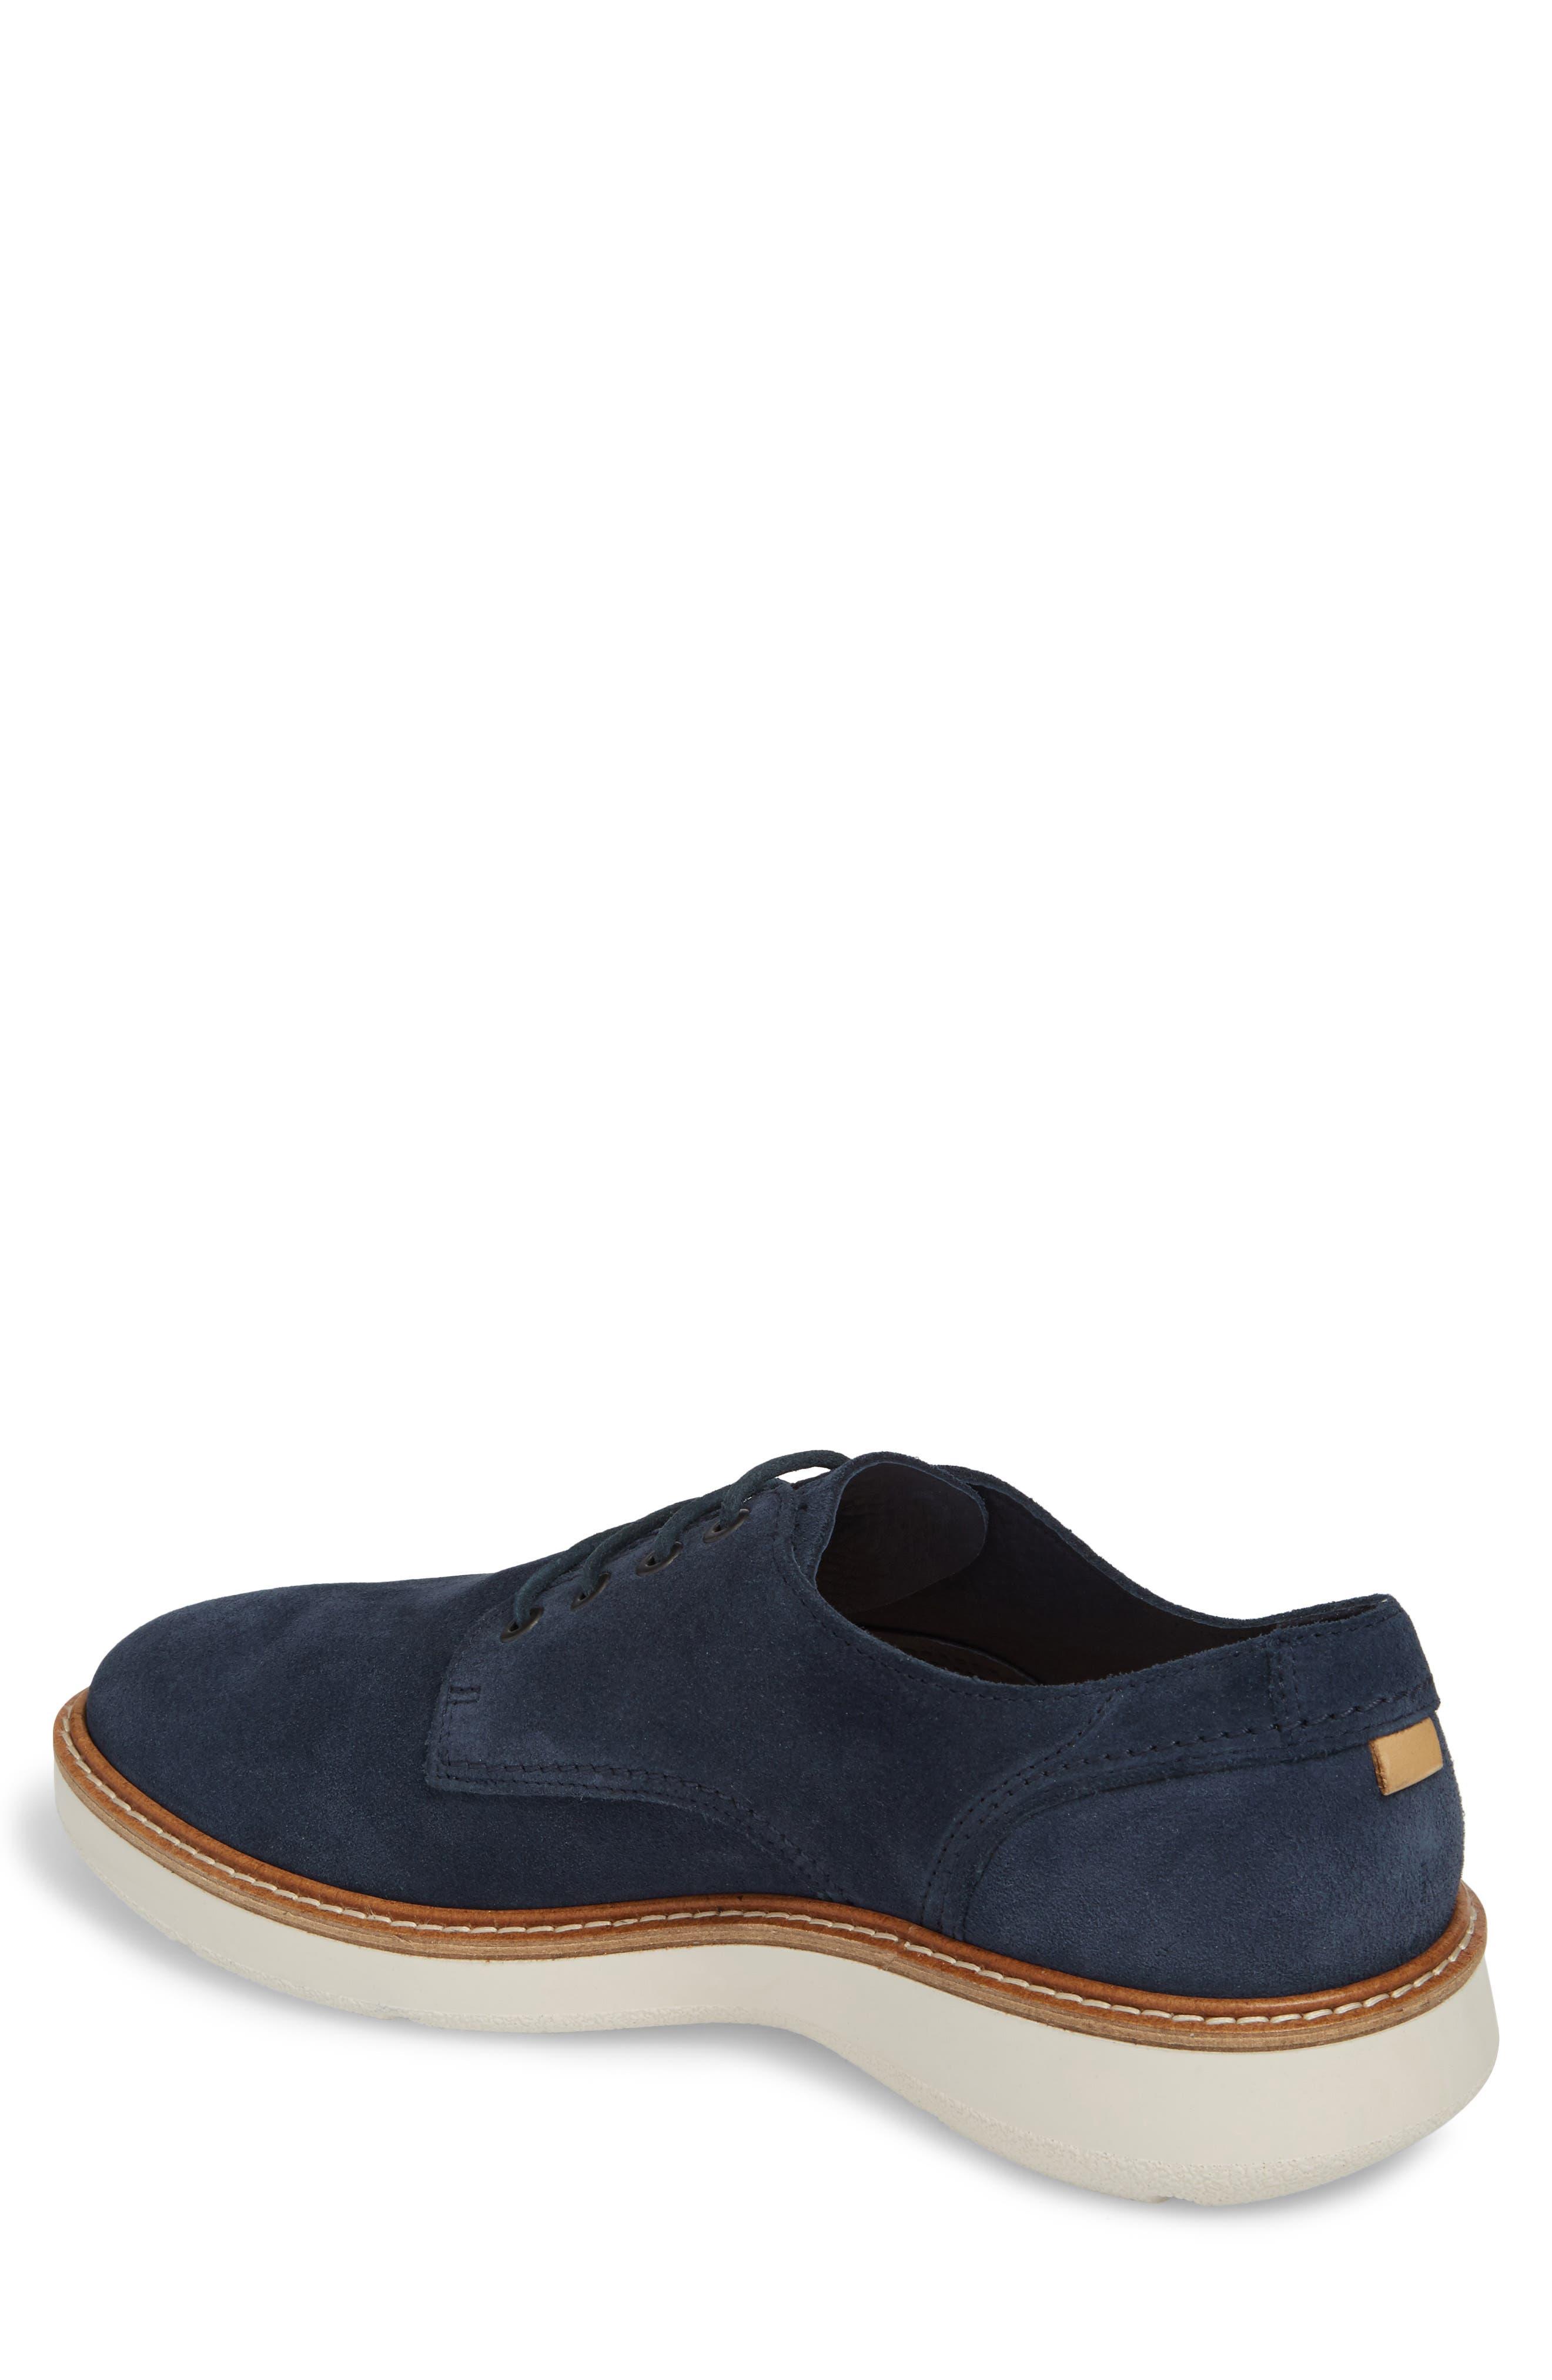 Aurora Hybrid Plain Toe Derby,                             Alternate thumbnail 2, color,                             Marine Leather